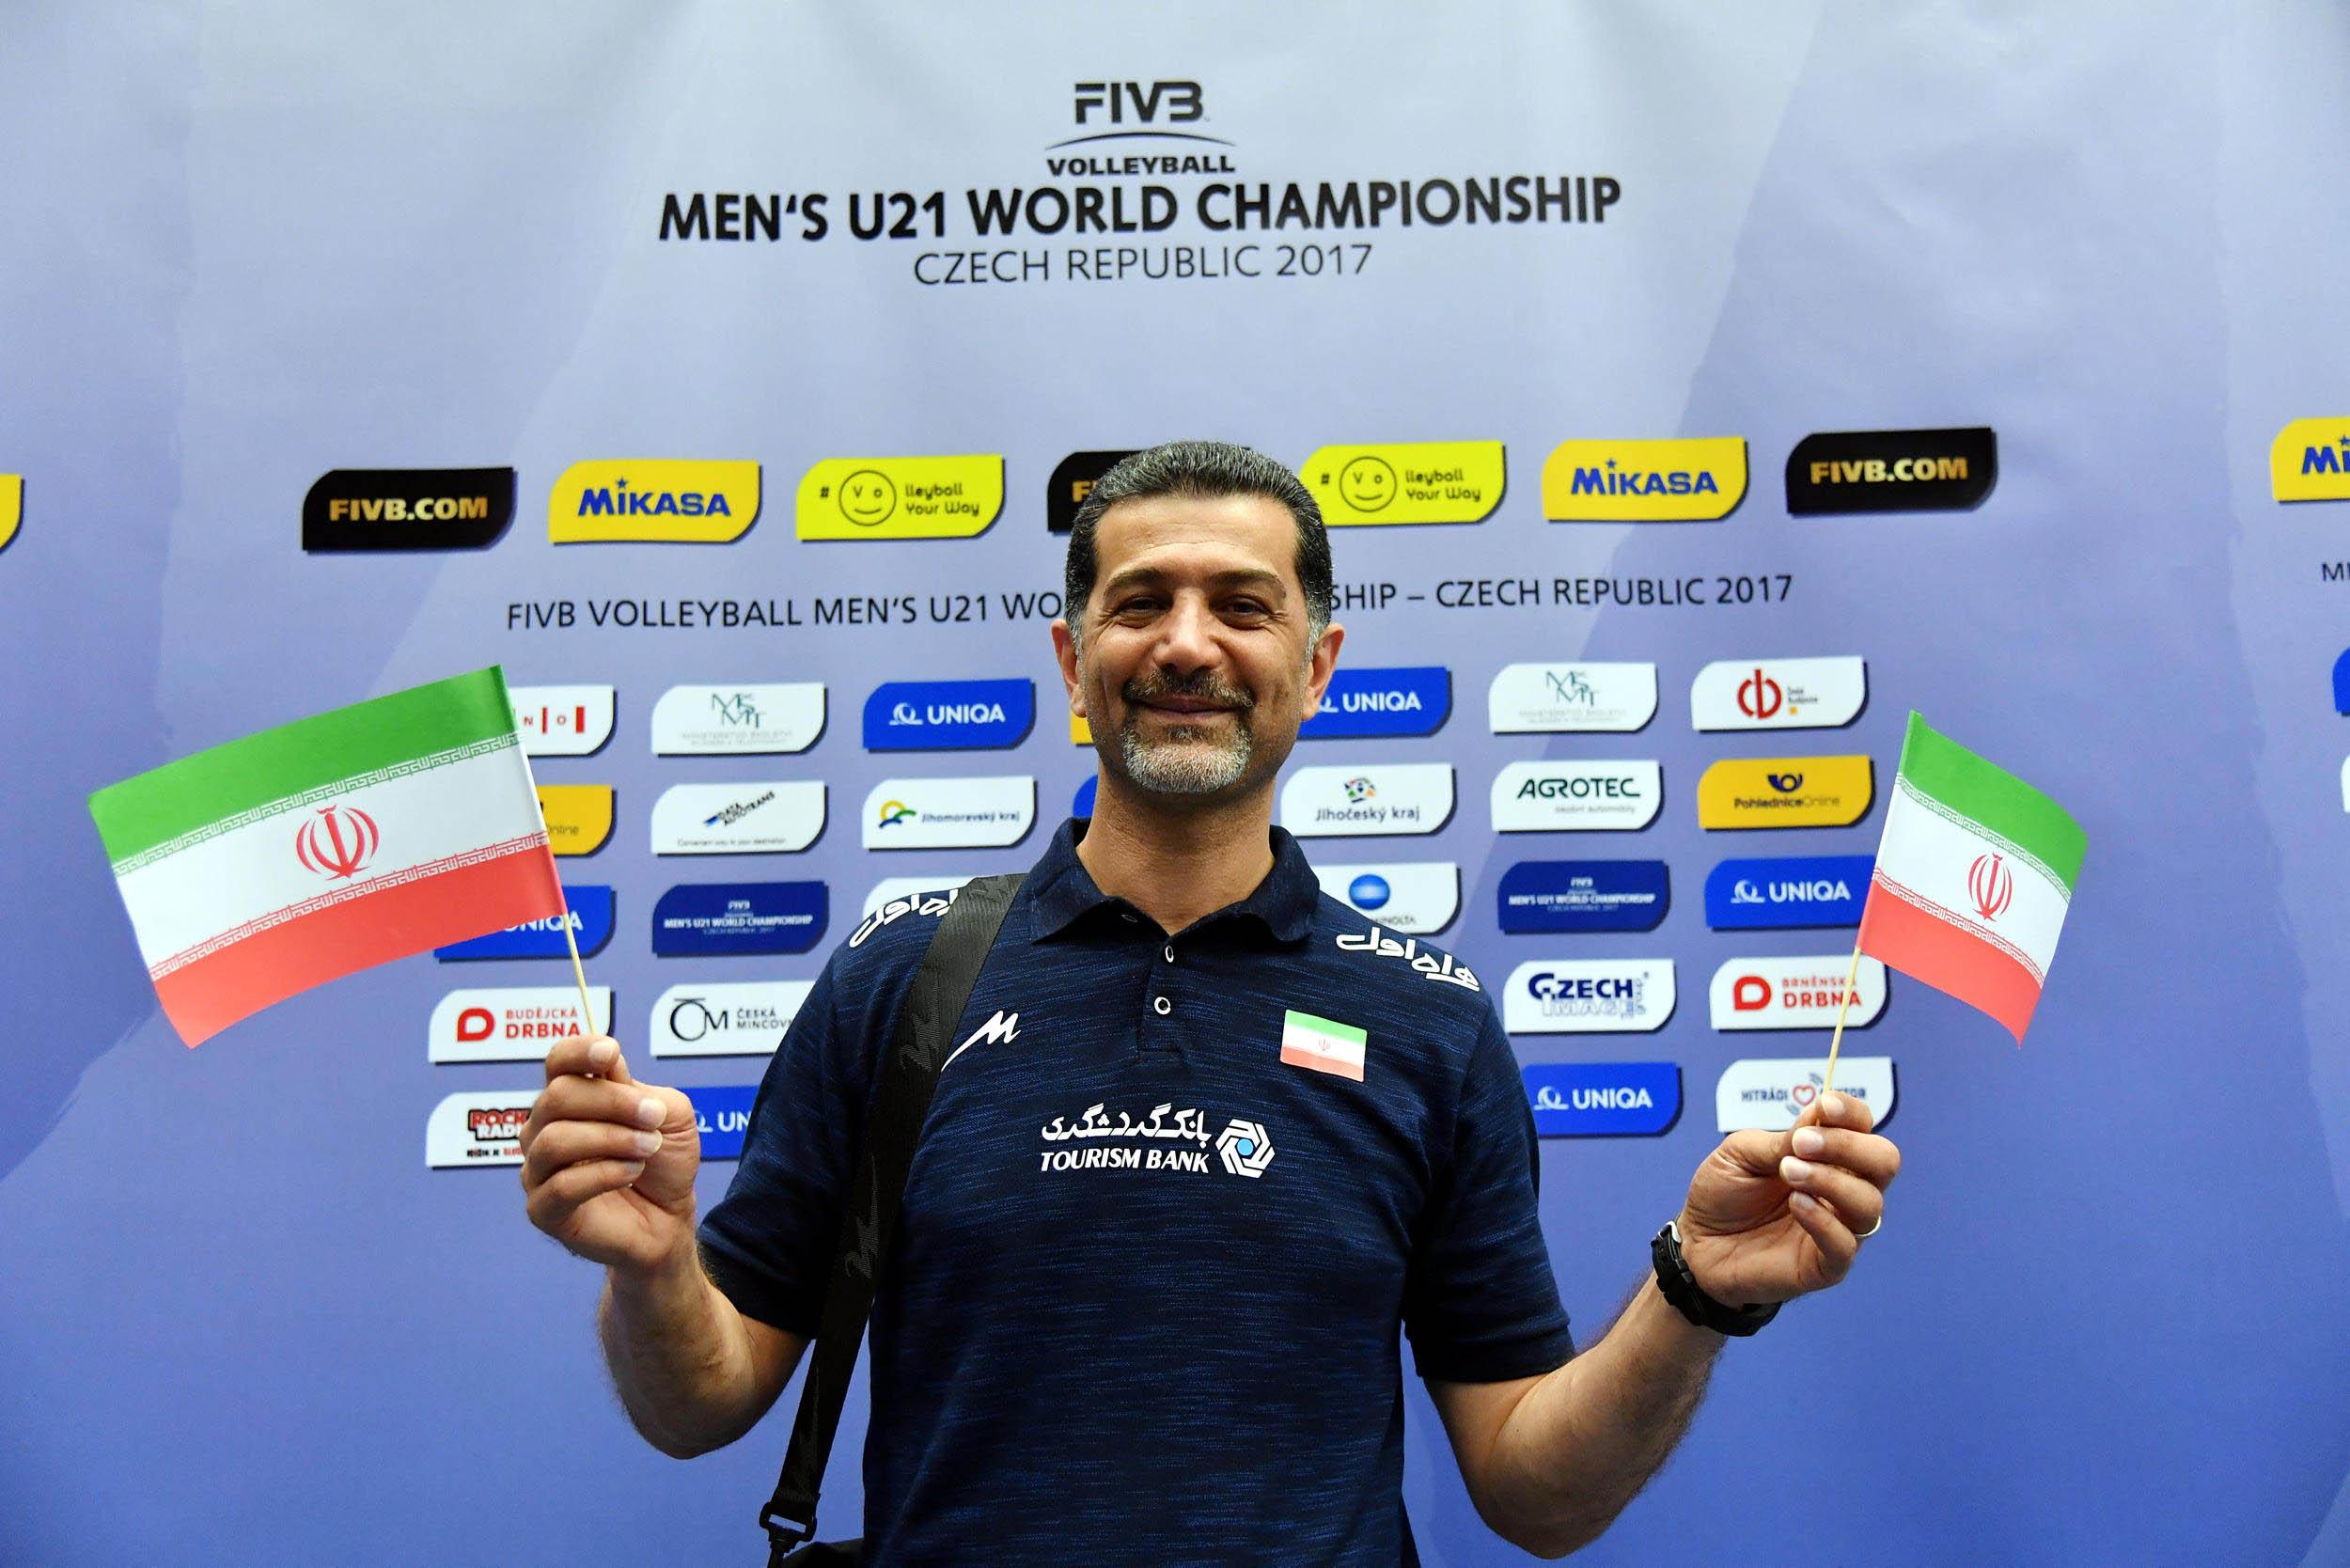 Post Match Iran Ukraine Fivb Volleyball Men S U21 World Championship 2017